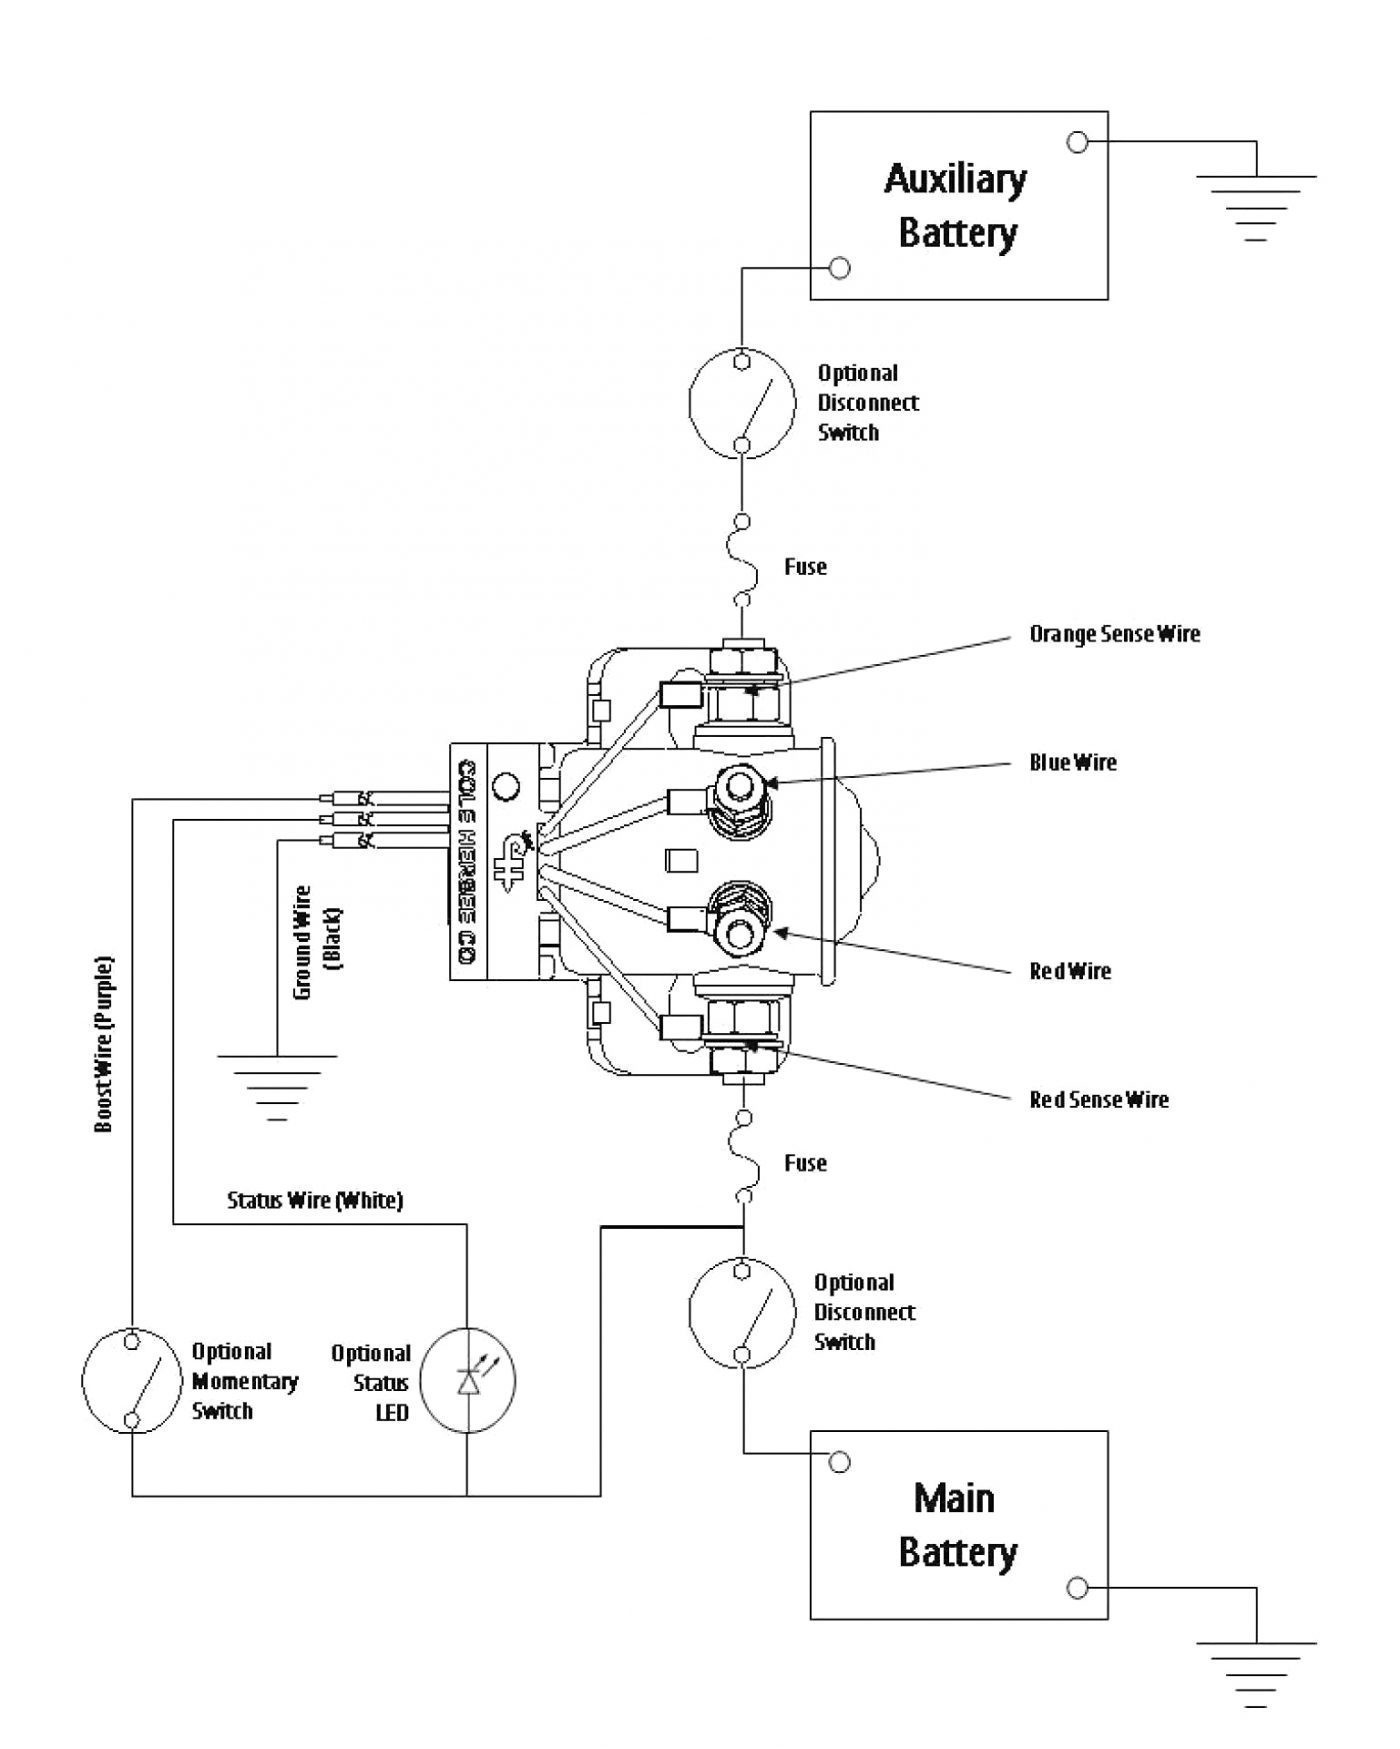 Vdo Oil Pressure Gauge Wiring Instructions Fe 1079] 11 Gauge Wire Diagram Free Diagram Of Vdo Oil Pressure Gauge Wiring Instructions Wiring Diagram Oil Pressure 1992 Lumina